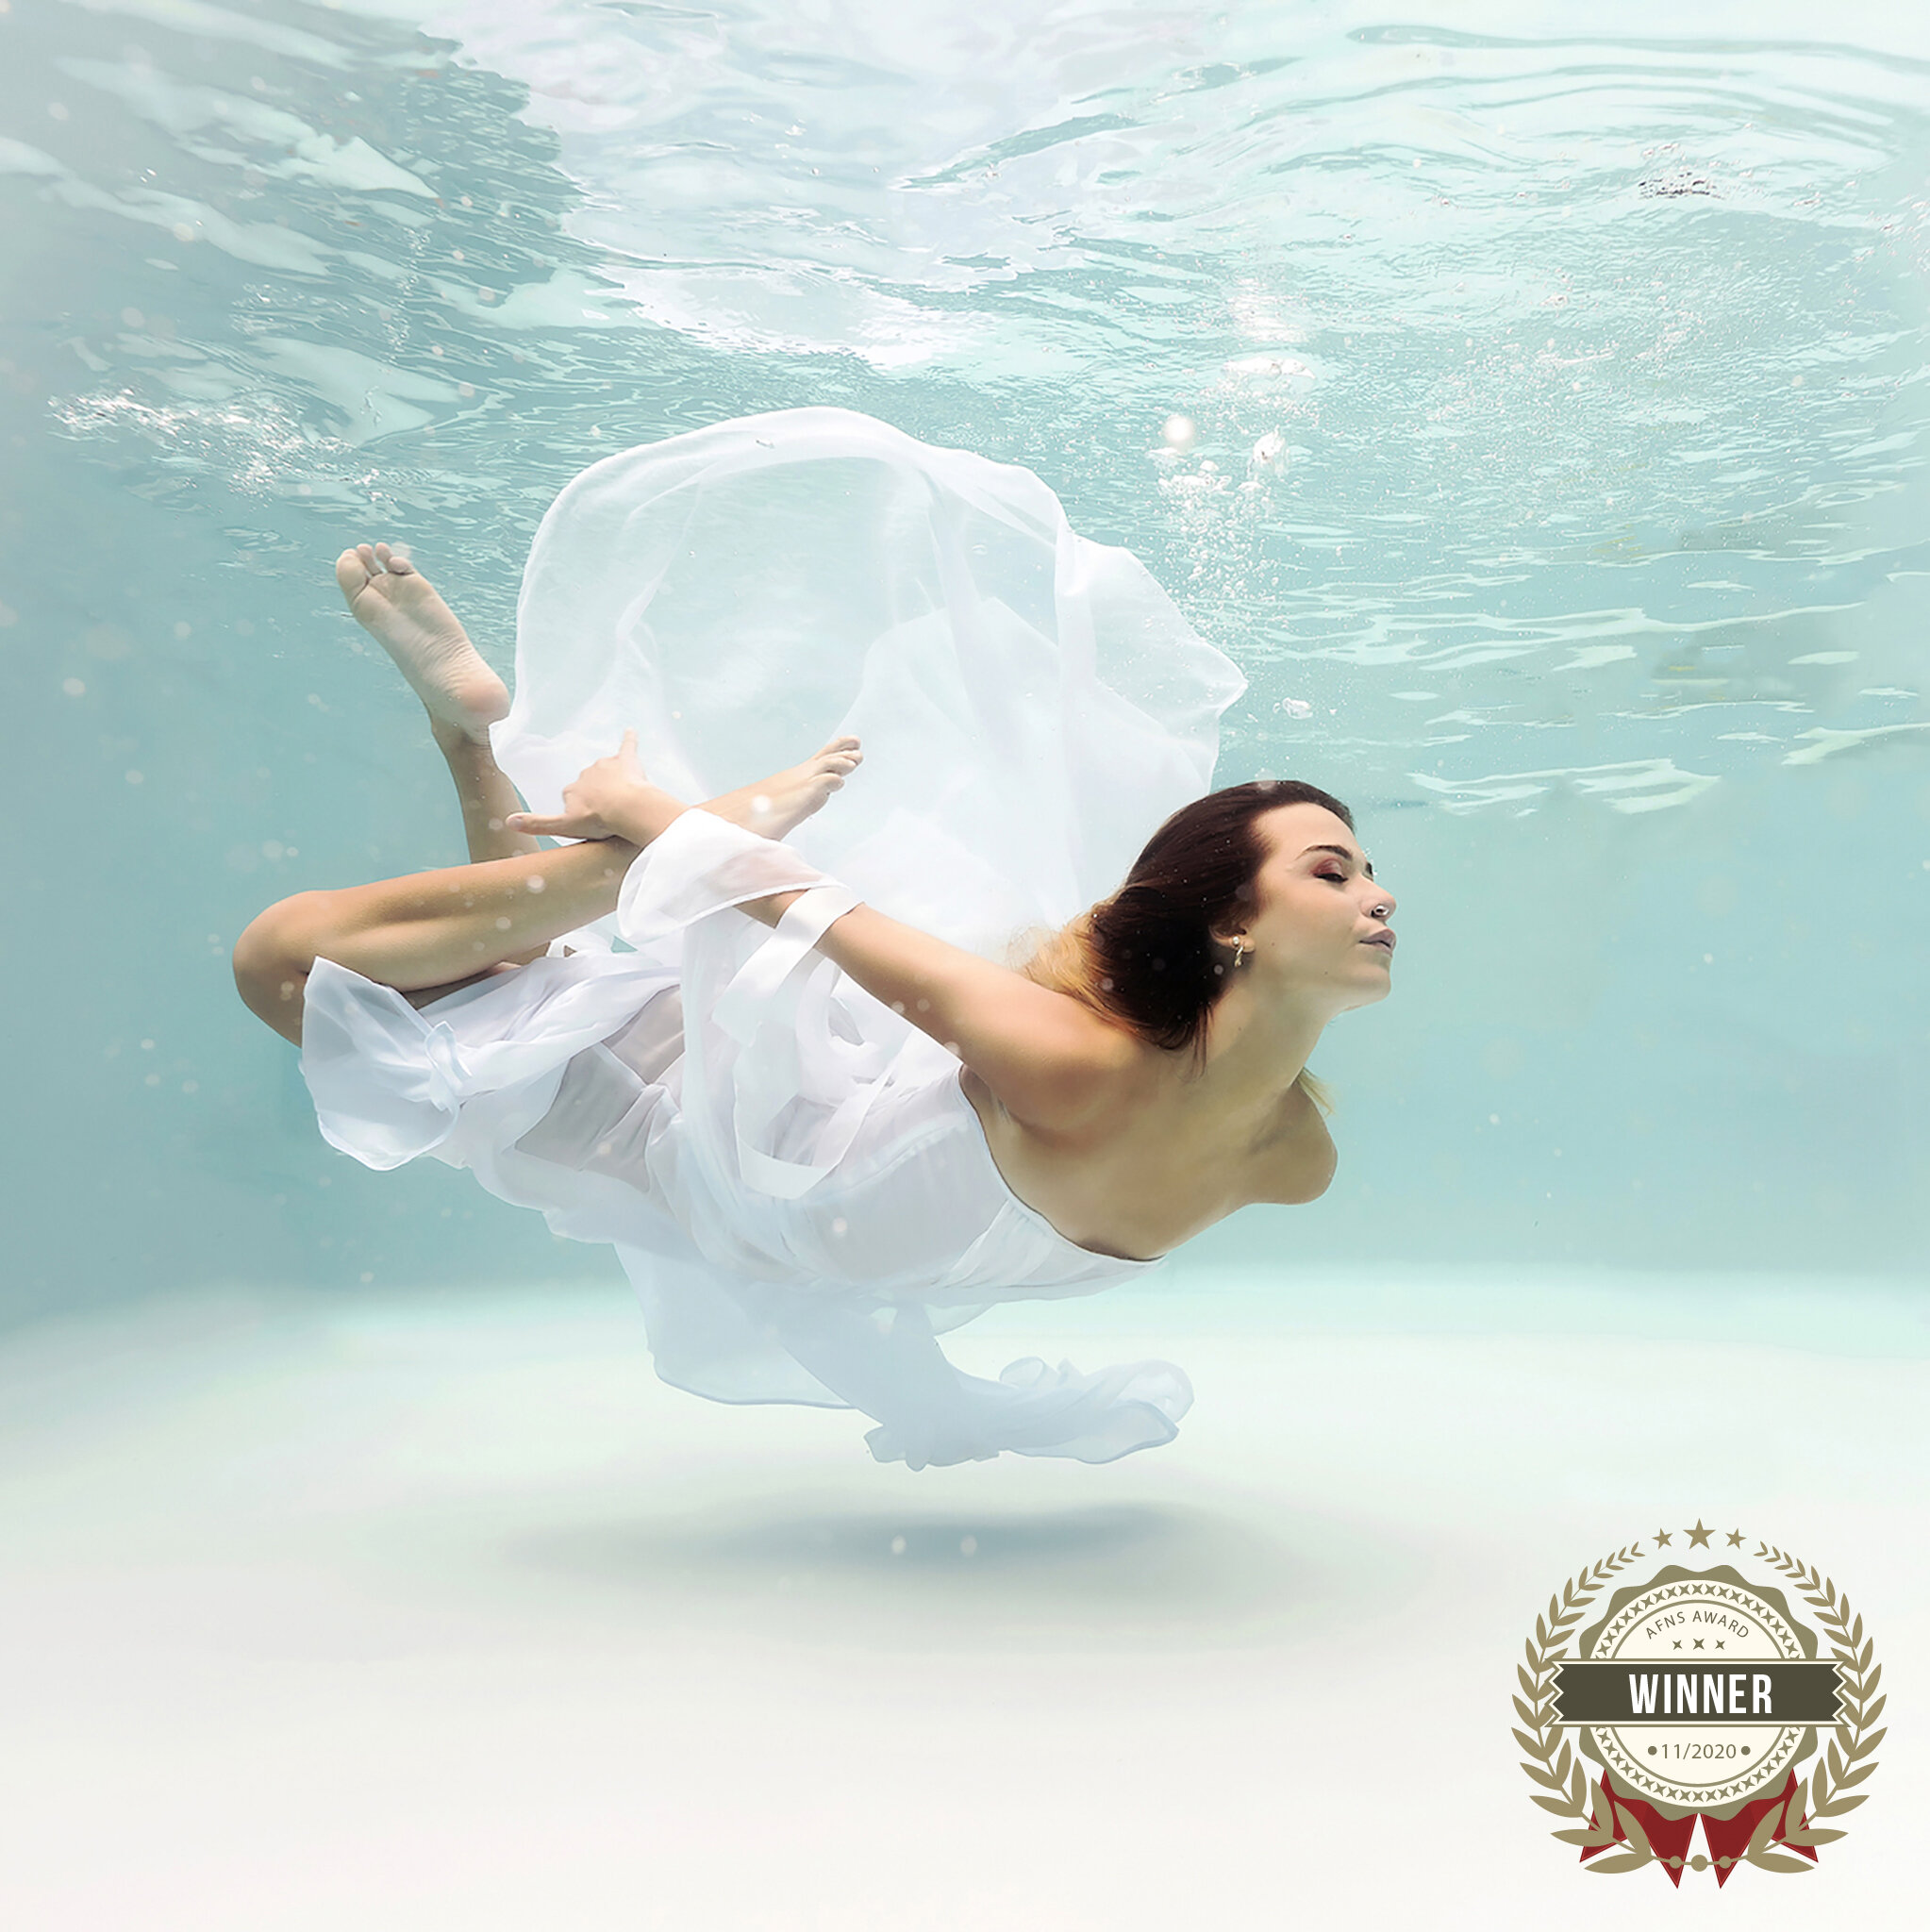 photographe aquatique savoie